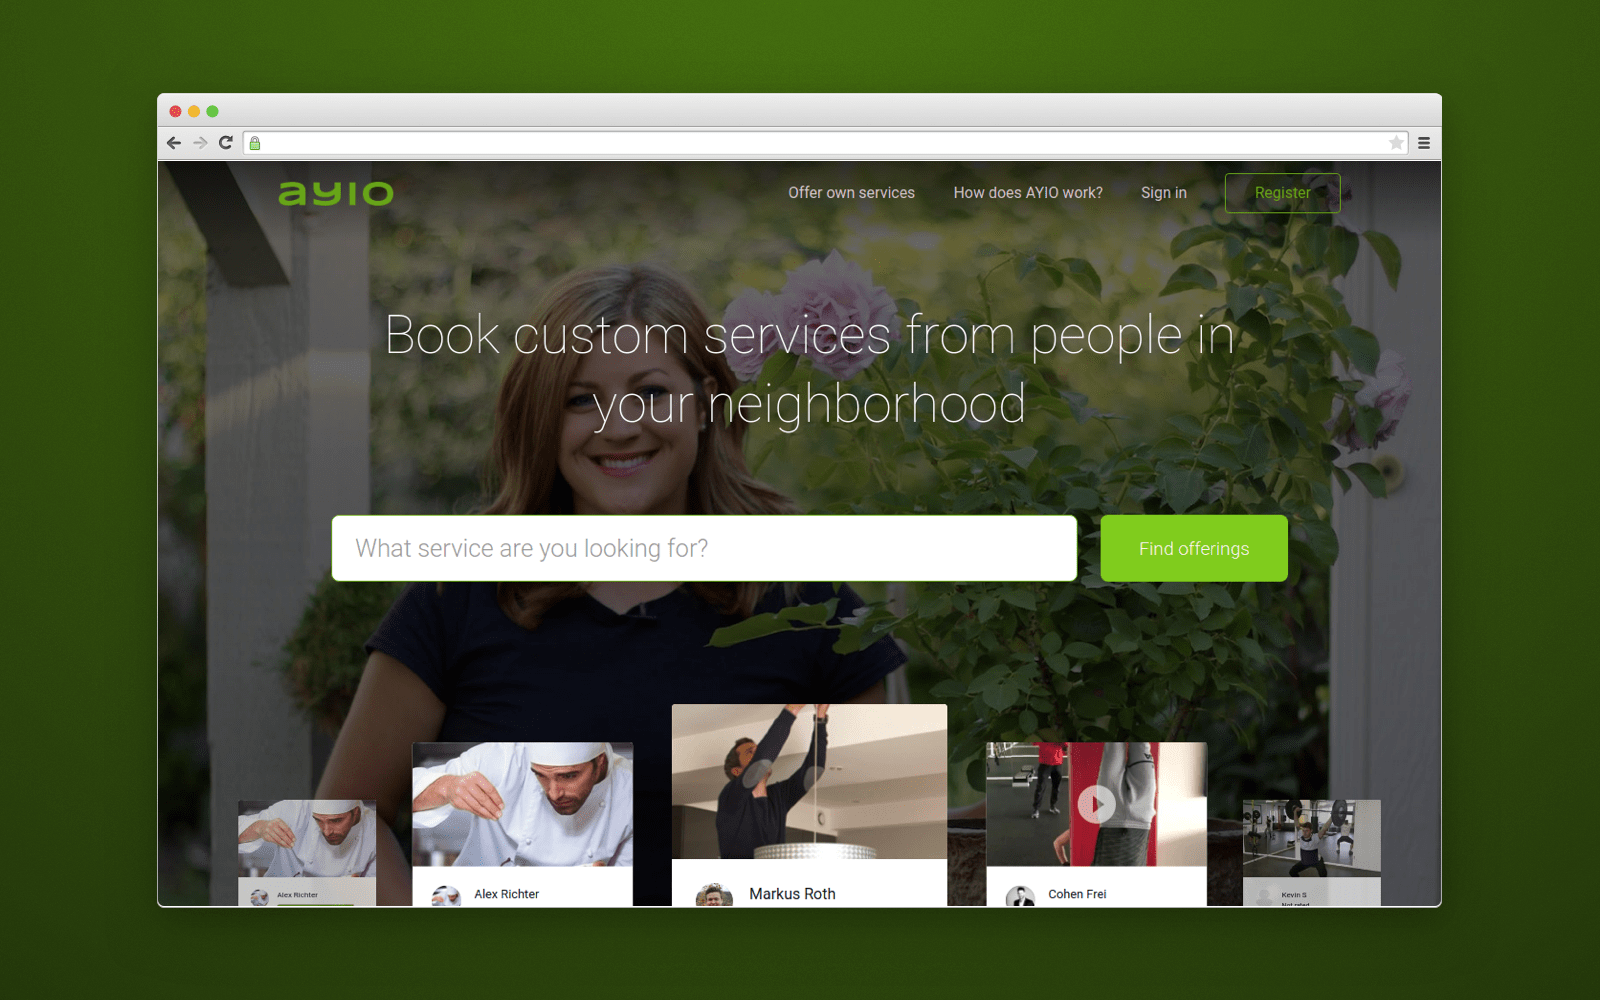 AYIO website